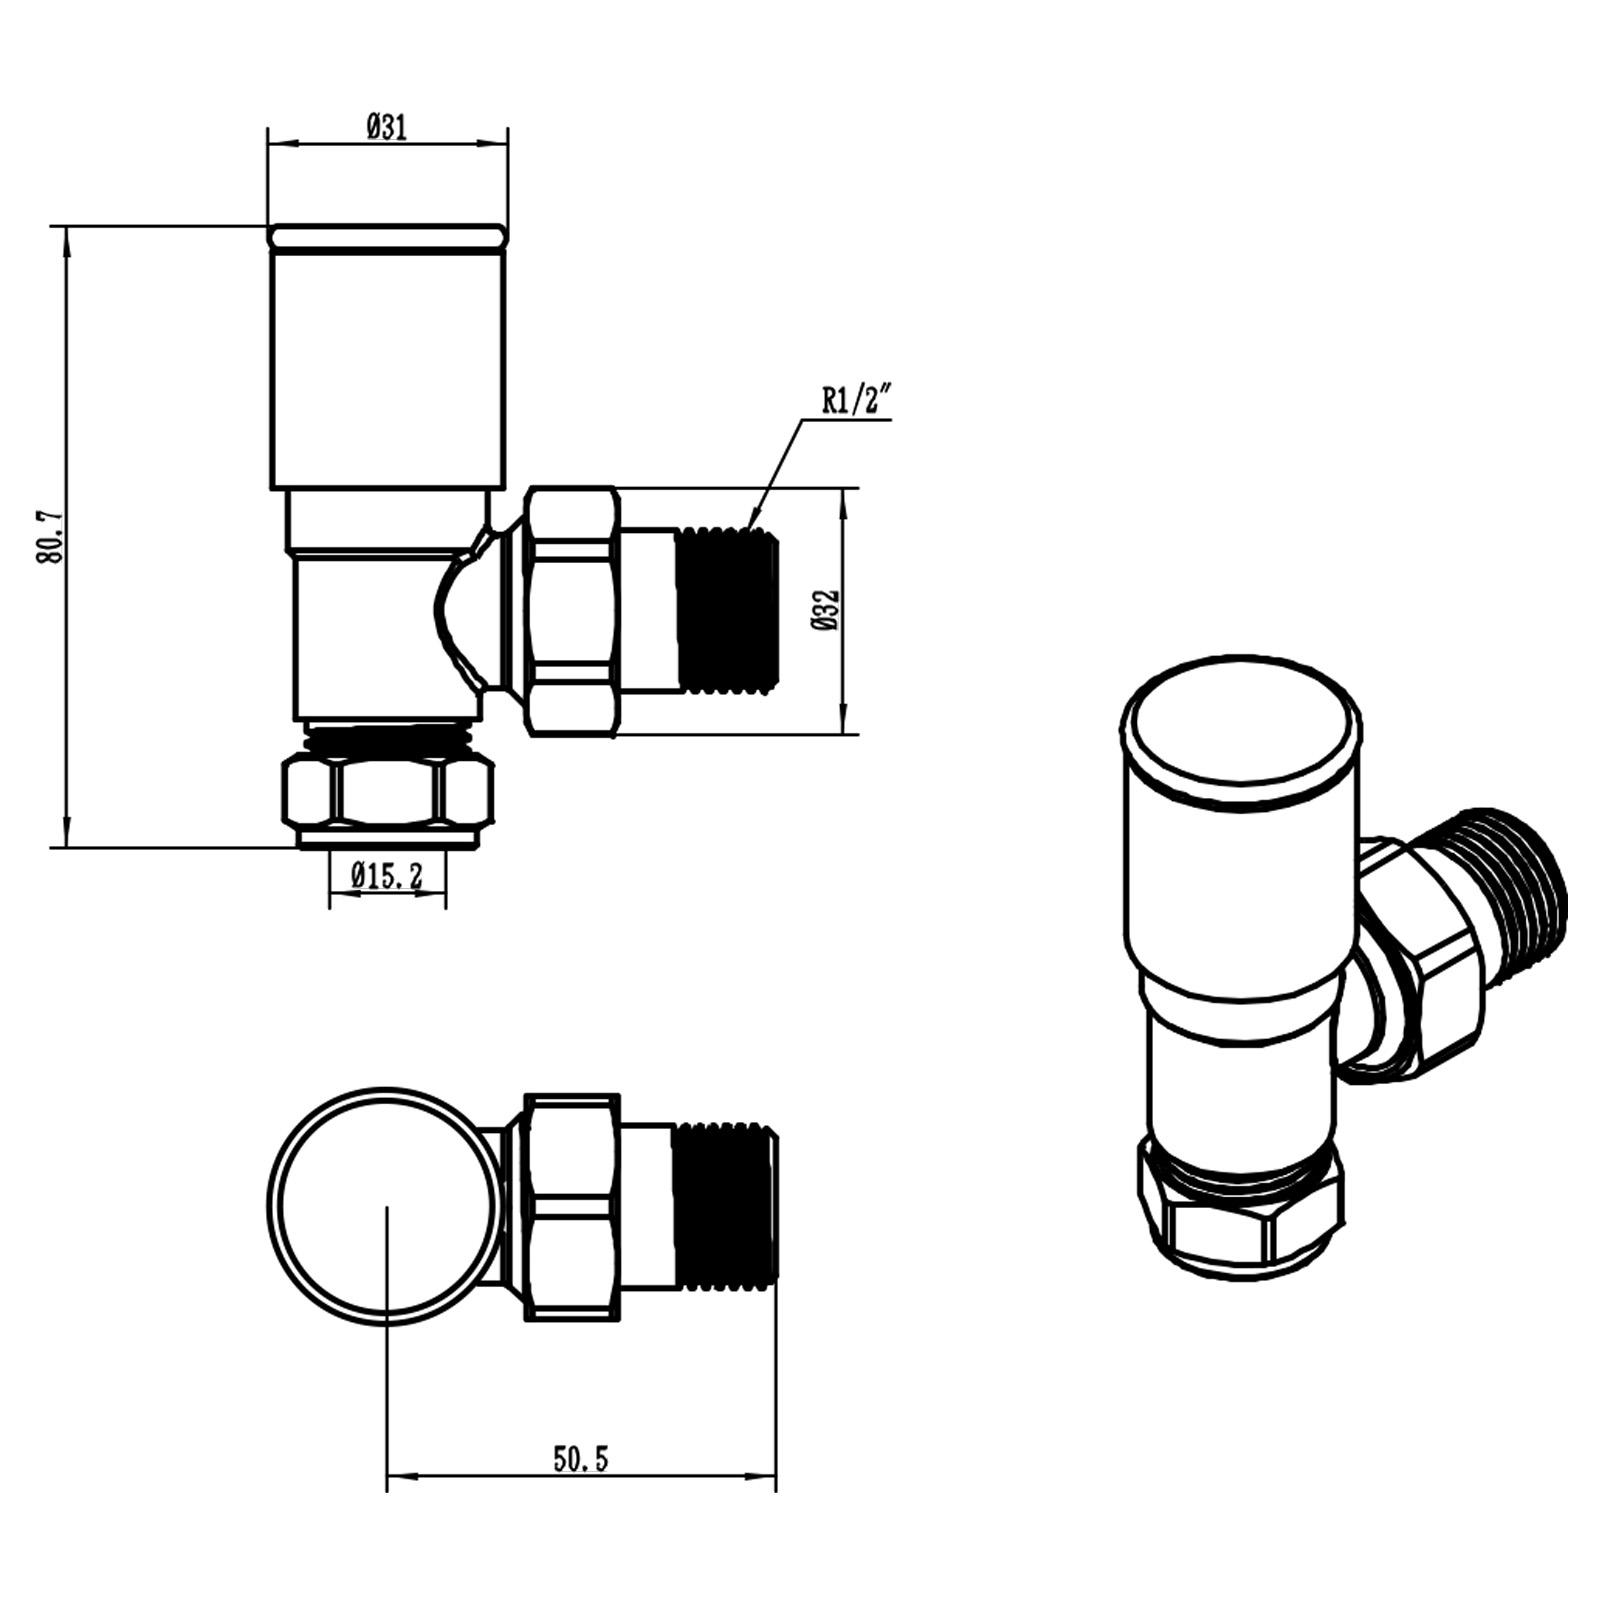 Chrome 15mm Pipe Connection Radiator Valves